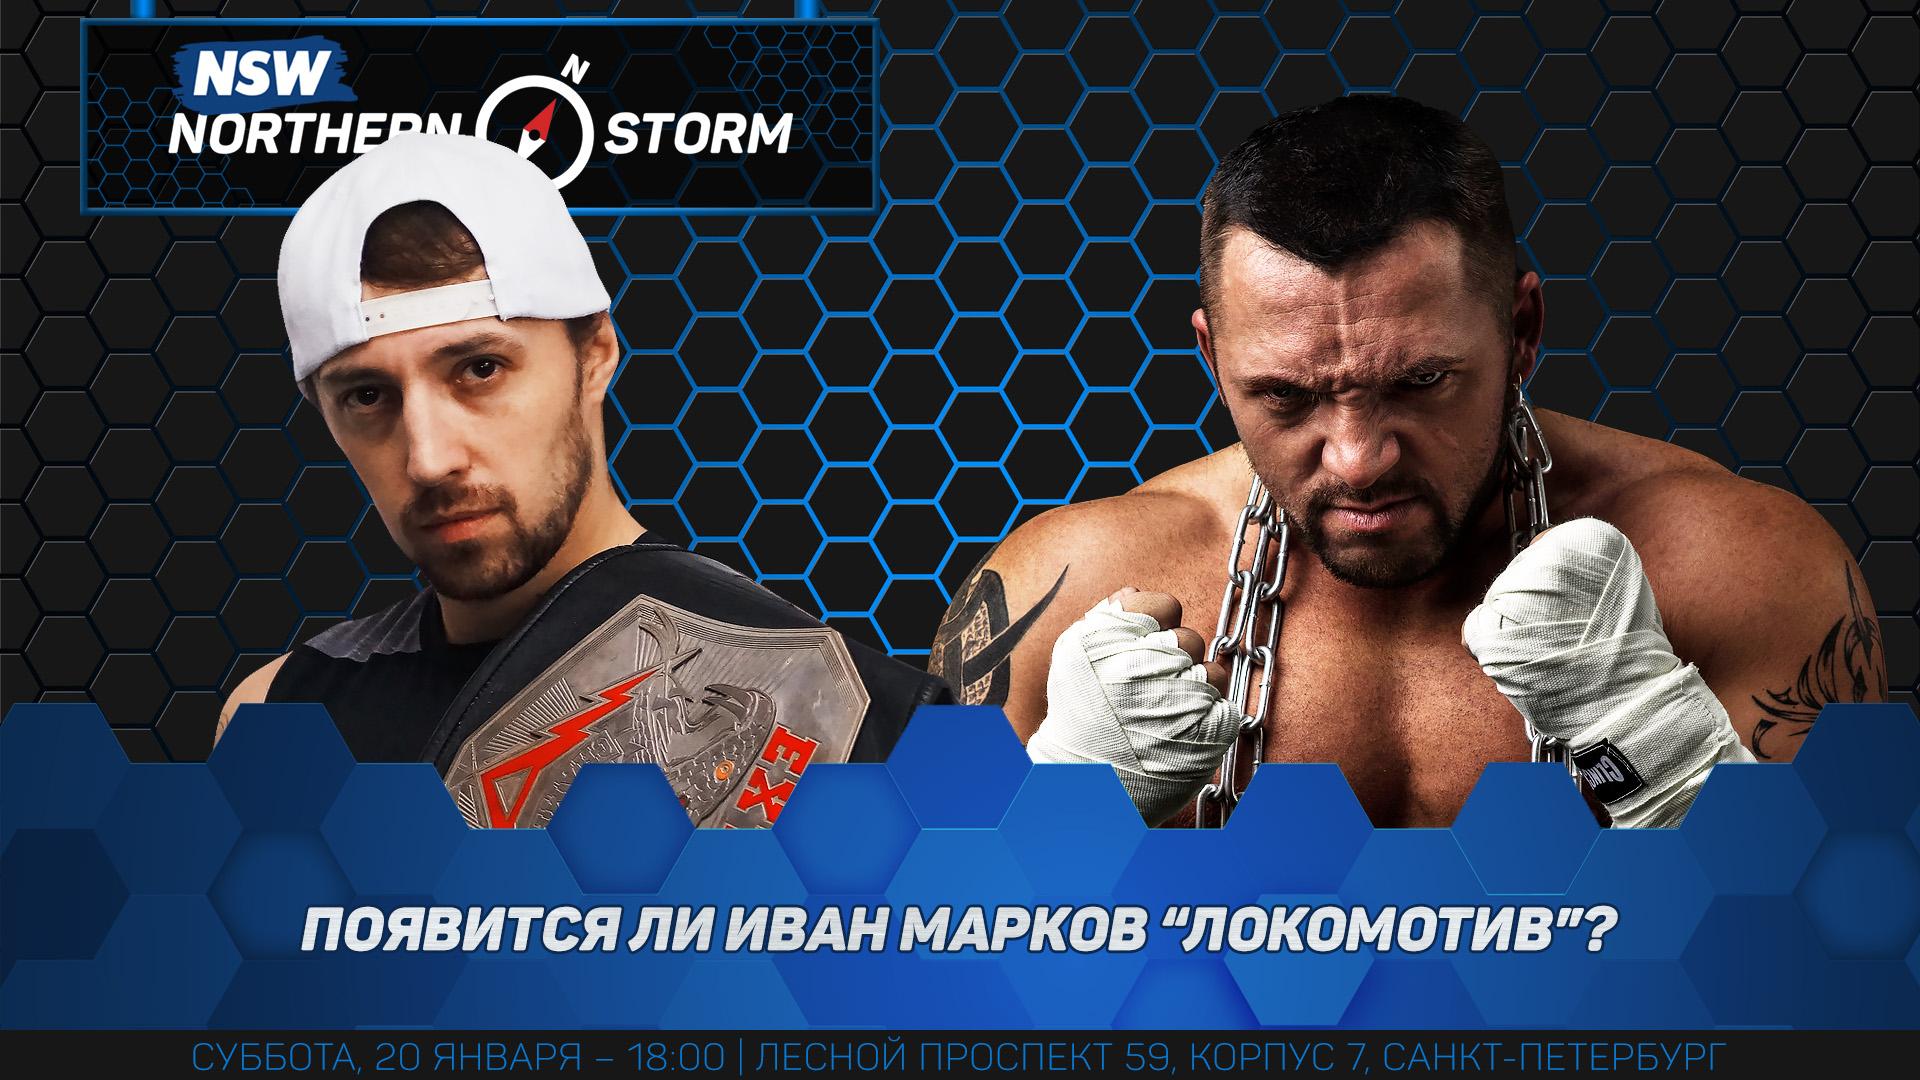 NSW Northern Storm (20/01): Появится ли Иван Марков 'Локомотив'